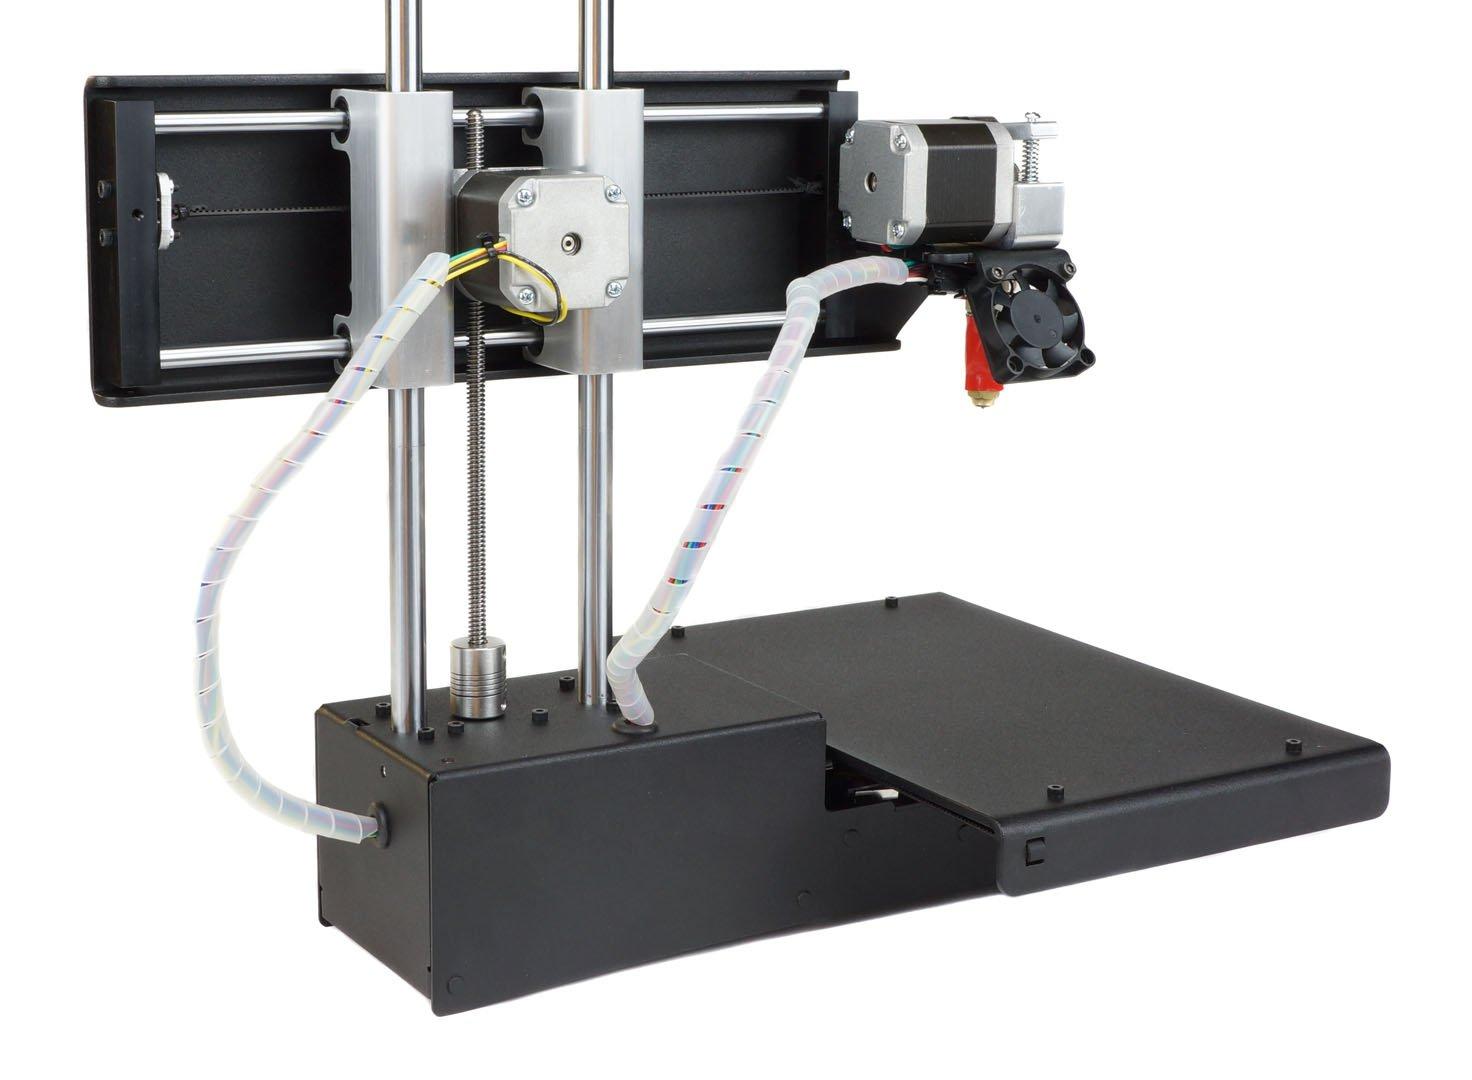 printrbot assembled metal simple 3d printer black pla filament